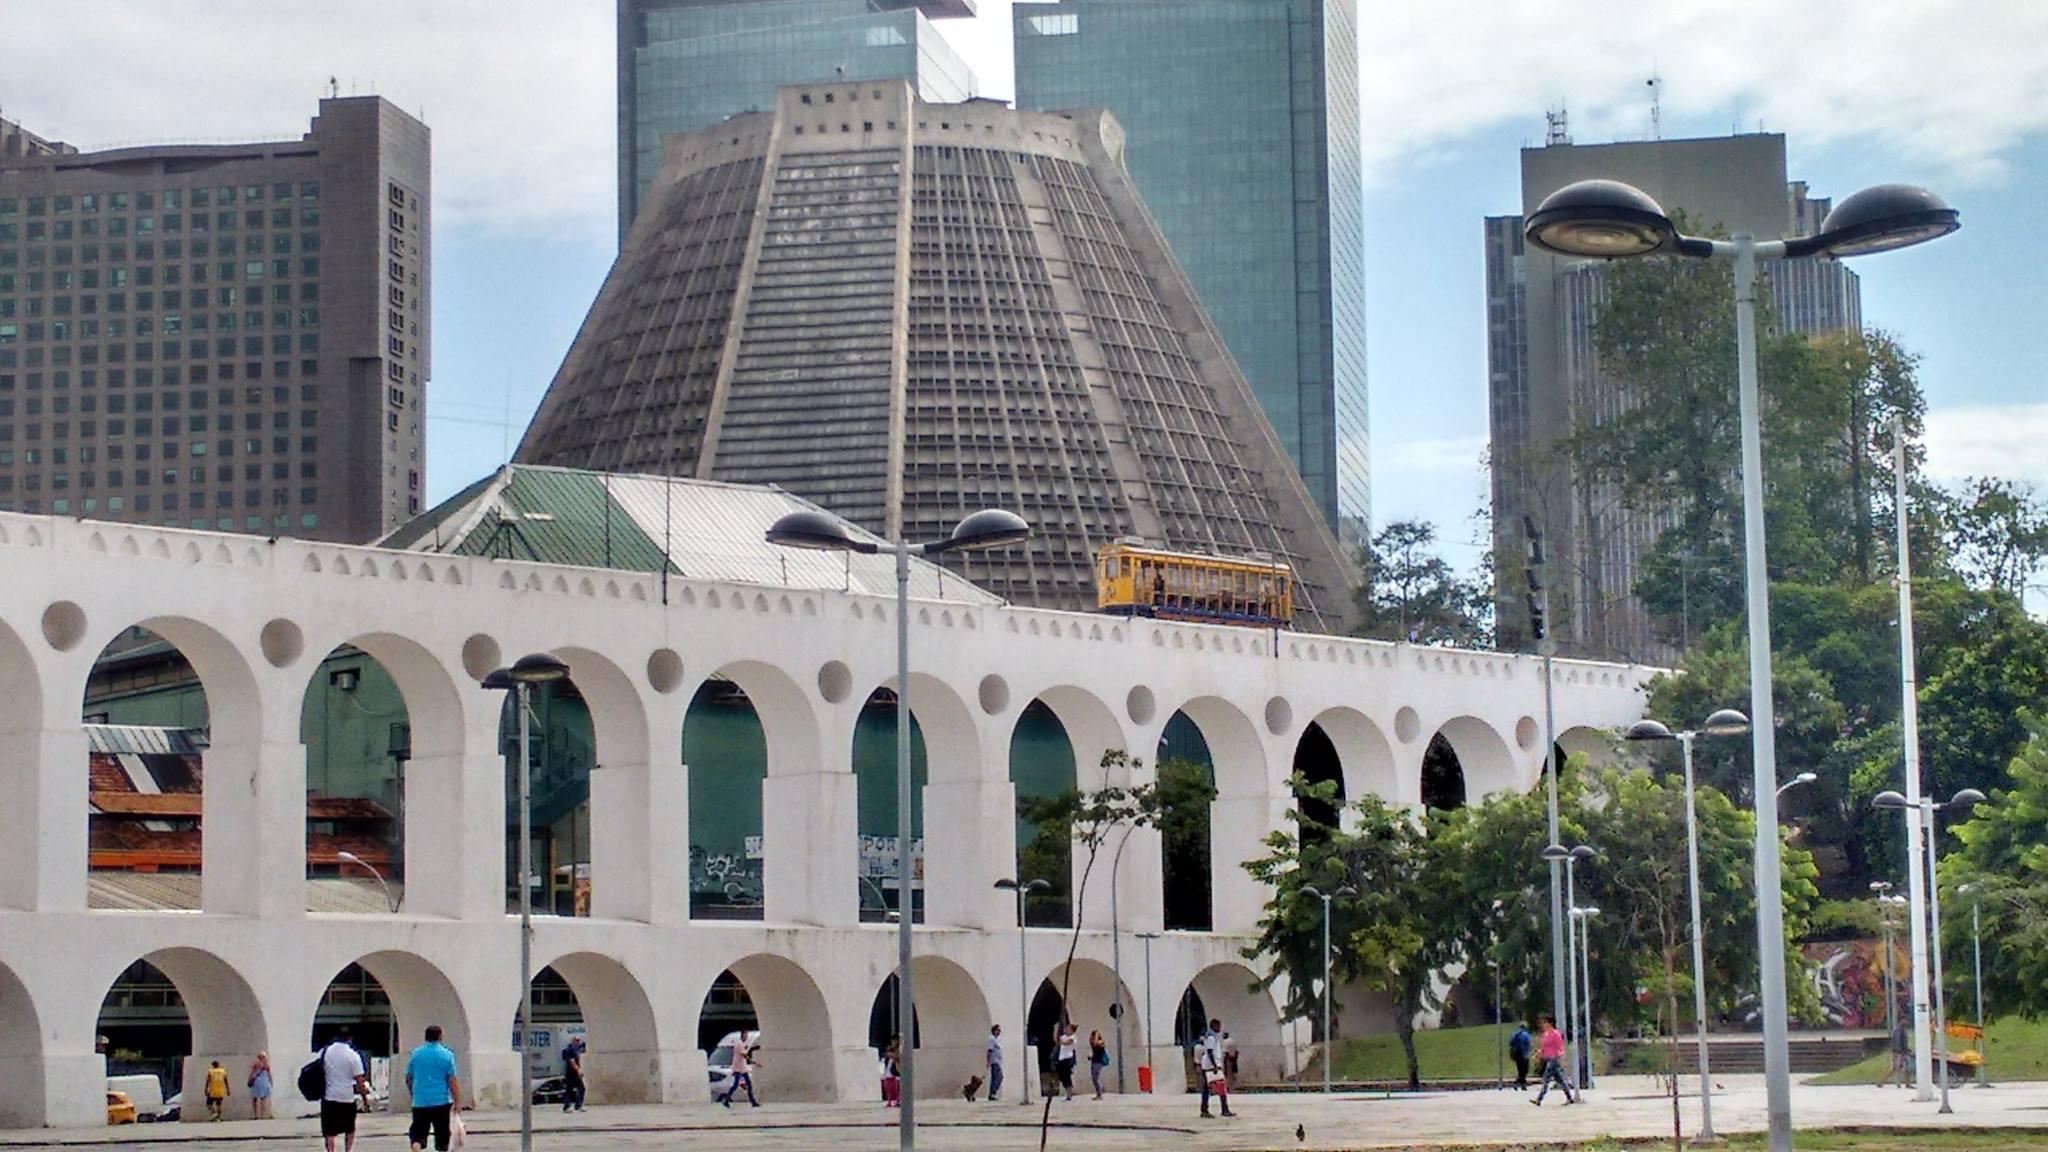 Rio, World Capital of Architecture by Unesco